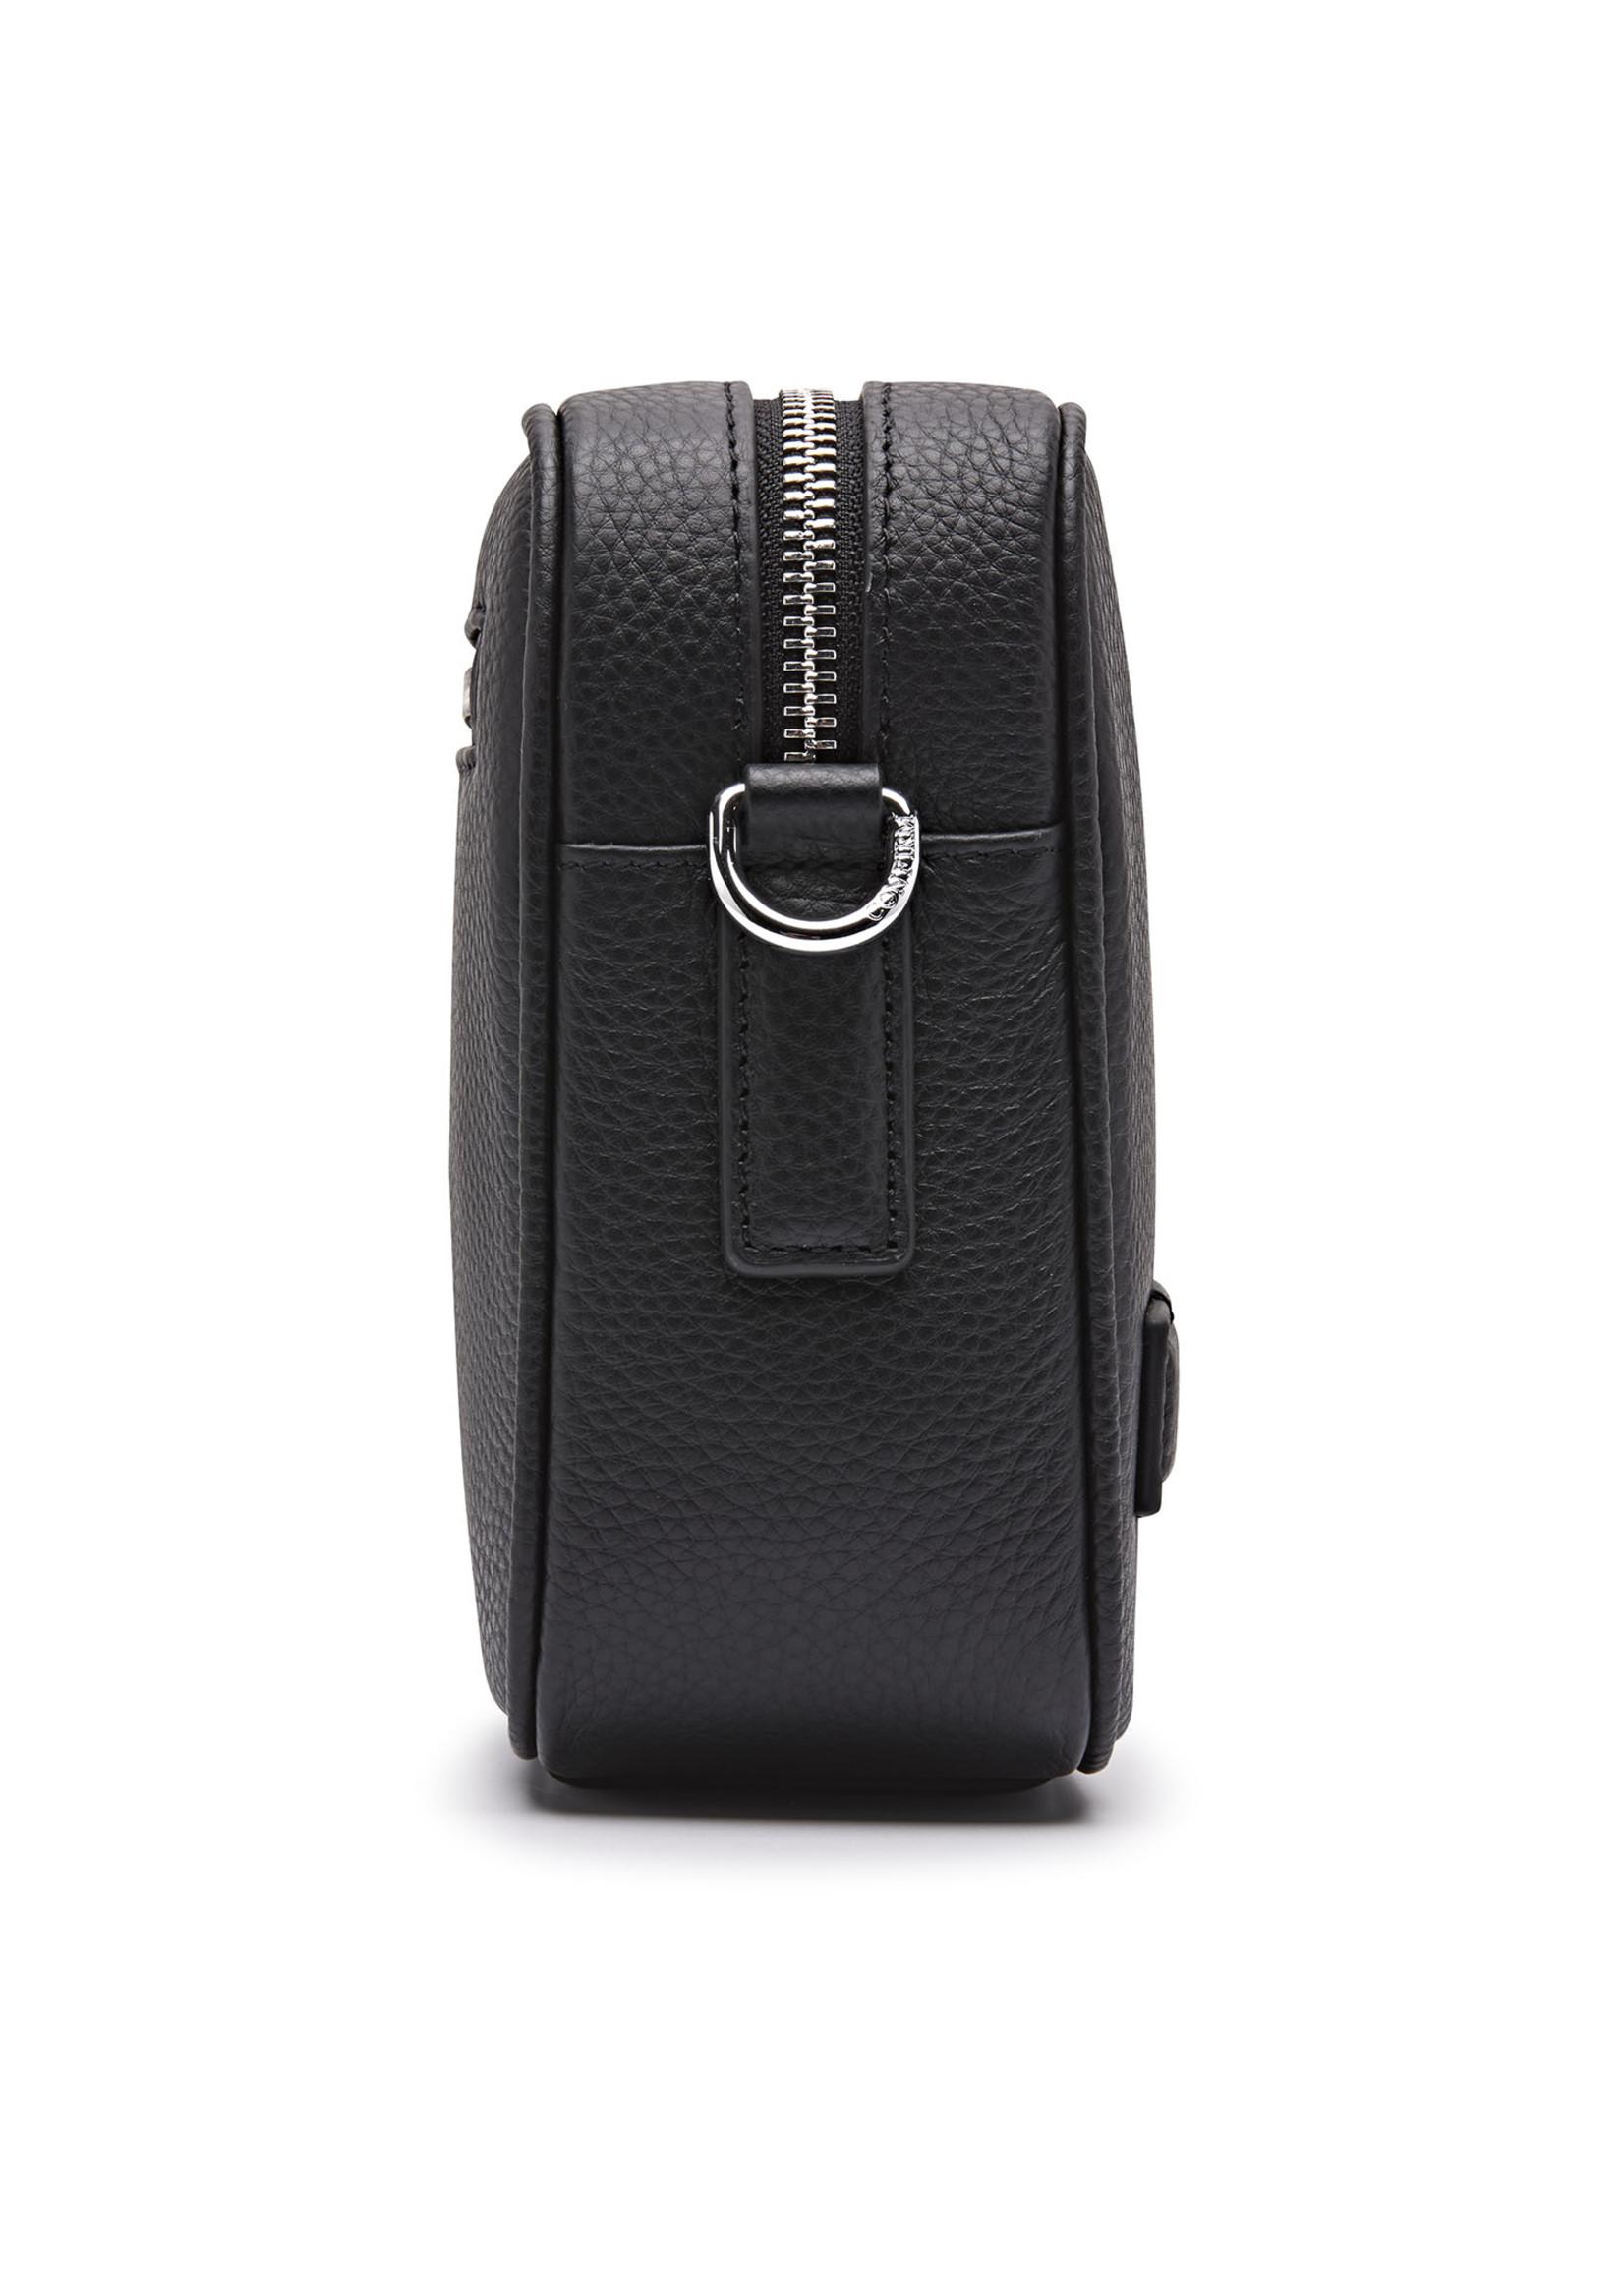 Confirm clutch Identitas 2.0 - TouchID